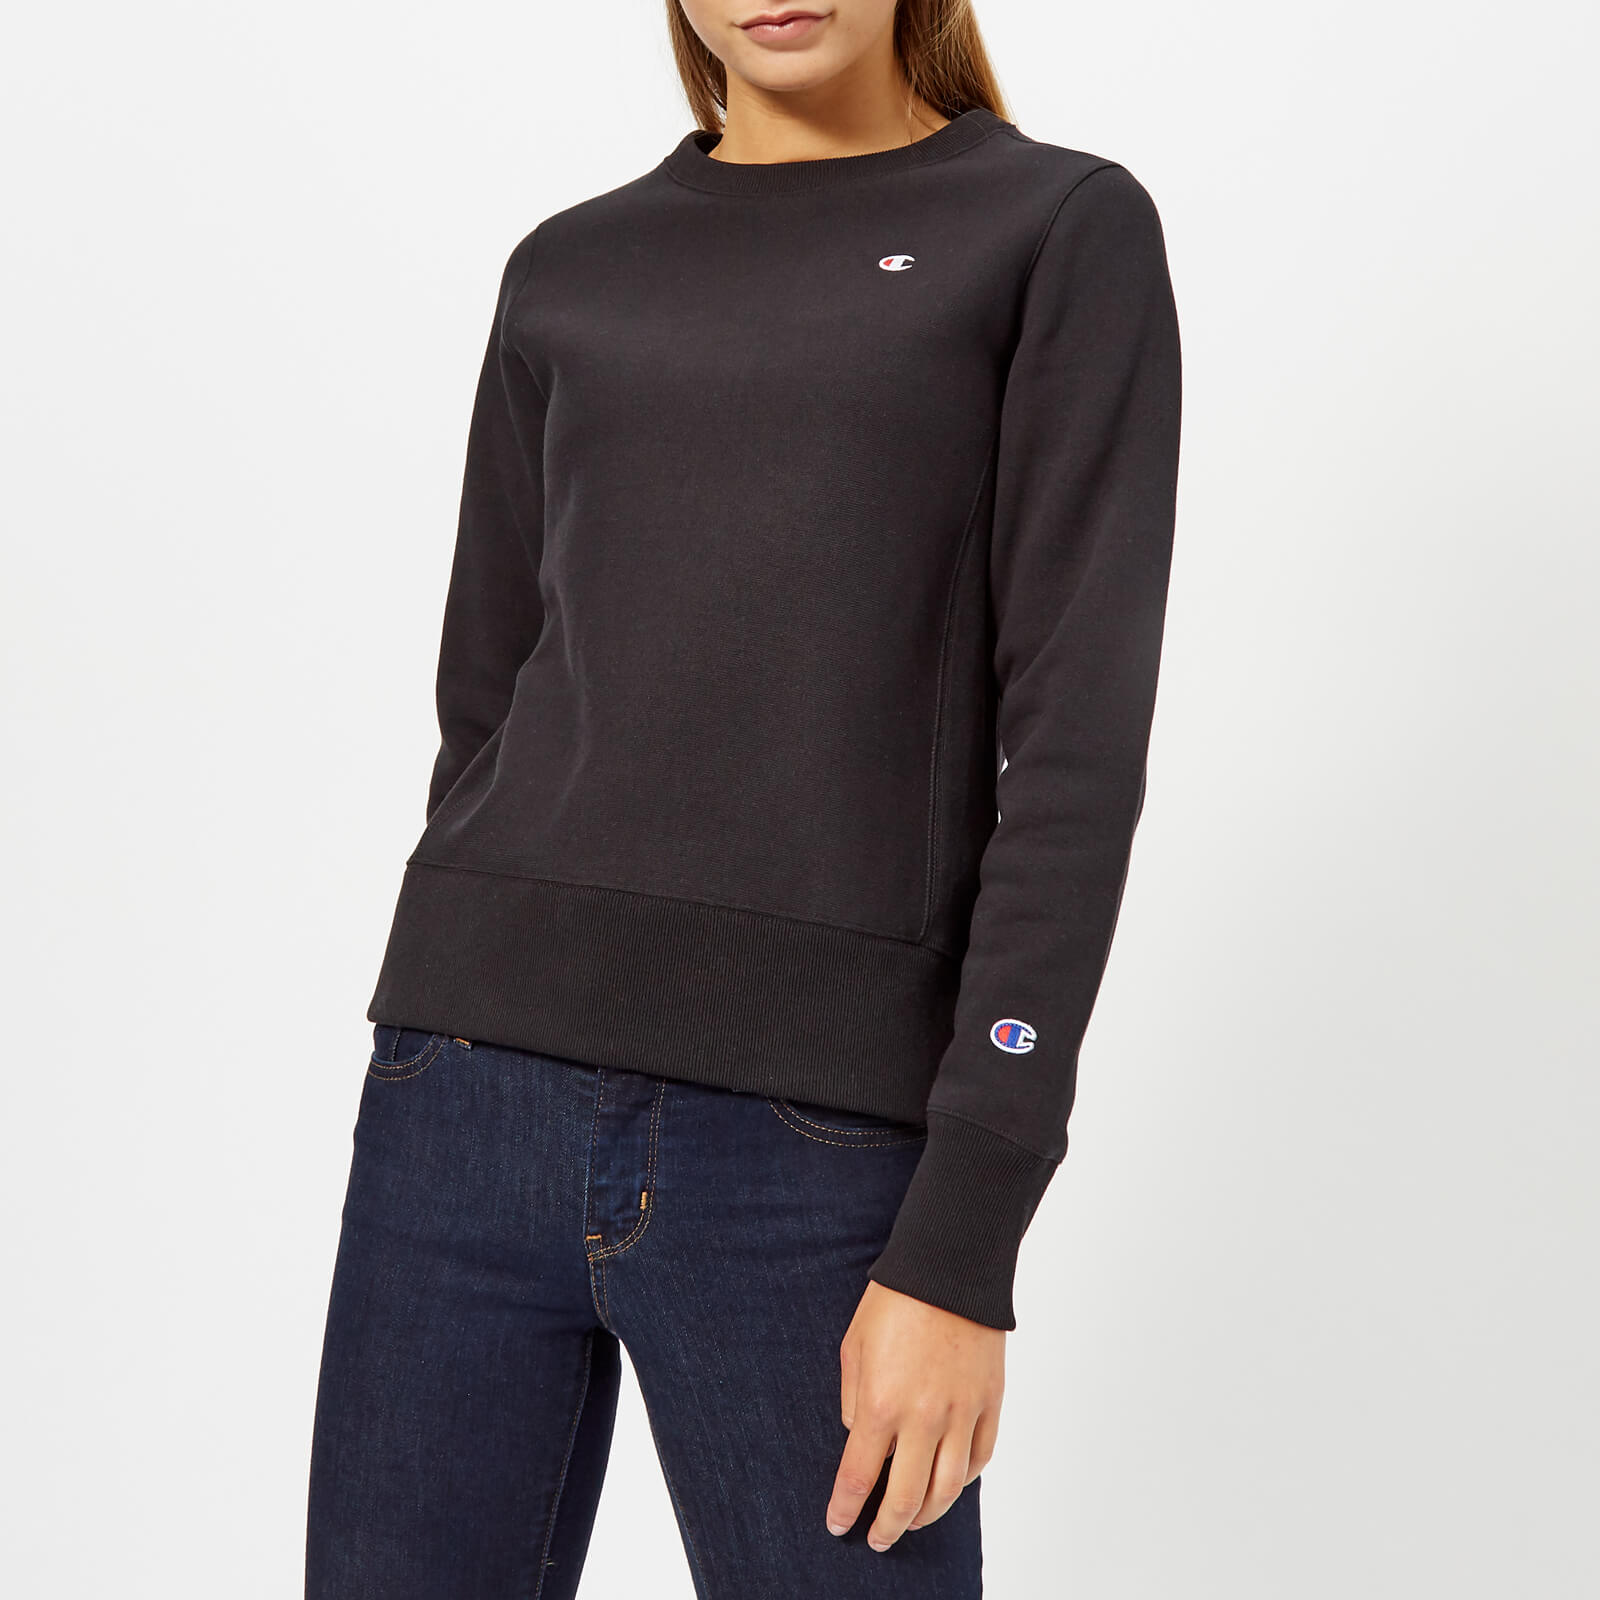 c63ab0497 Champion Women's Crew Neck Sweatshirt - Black